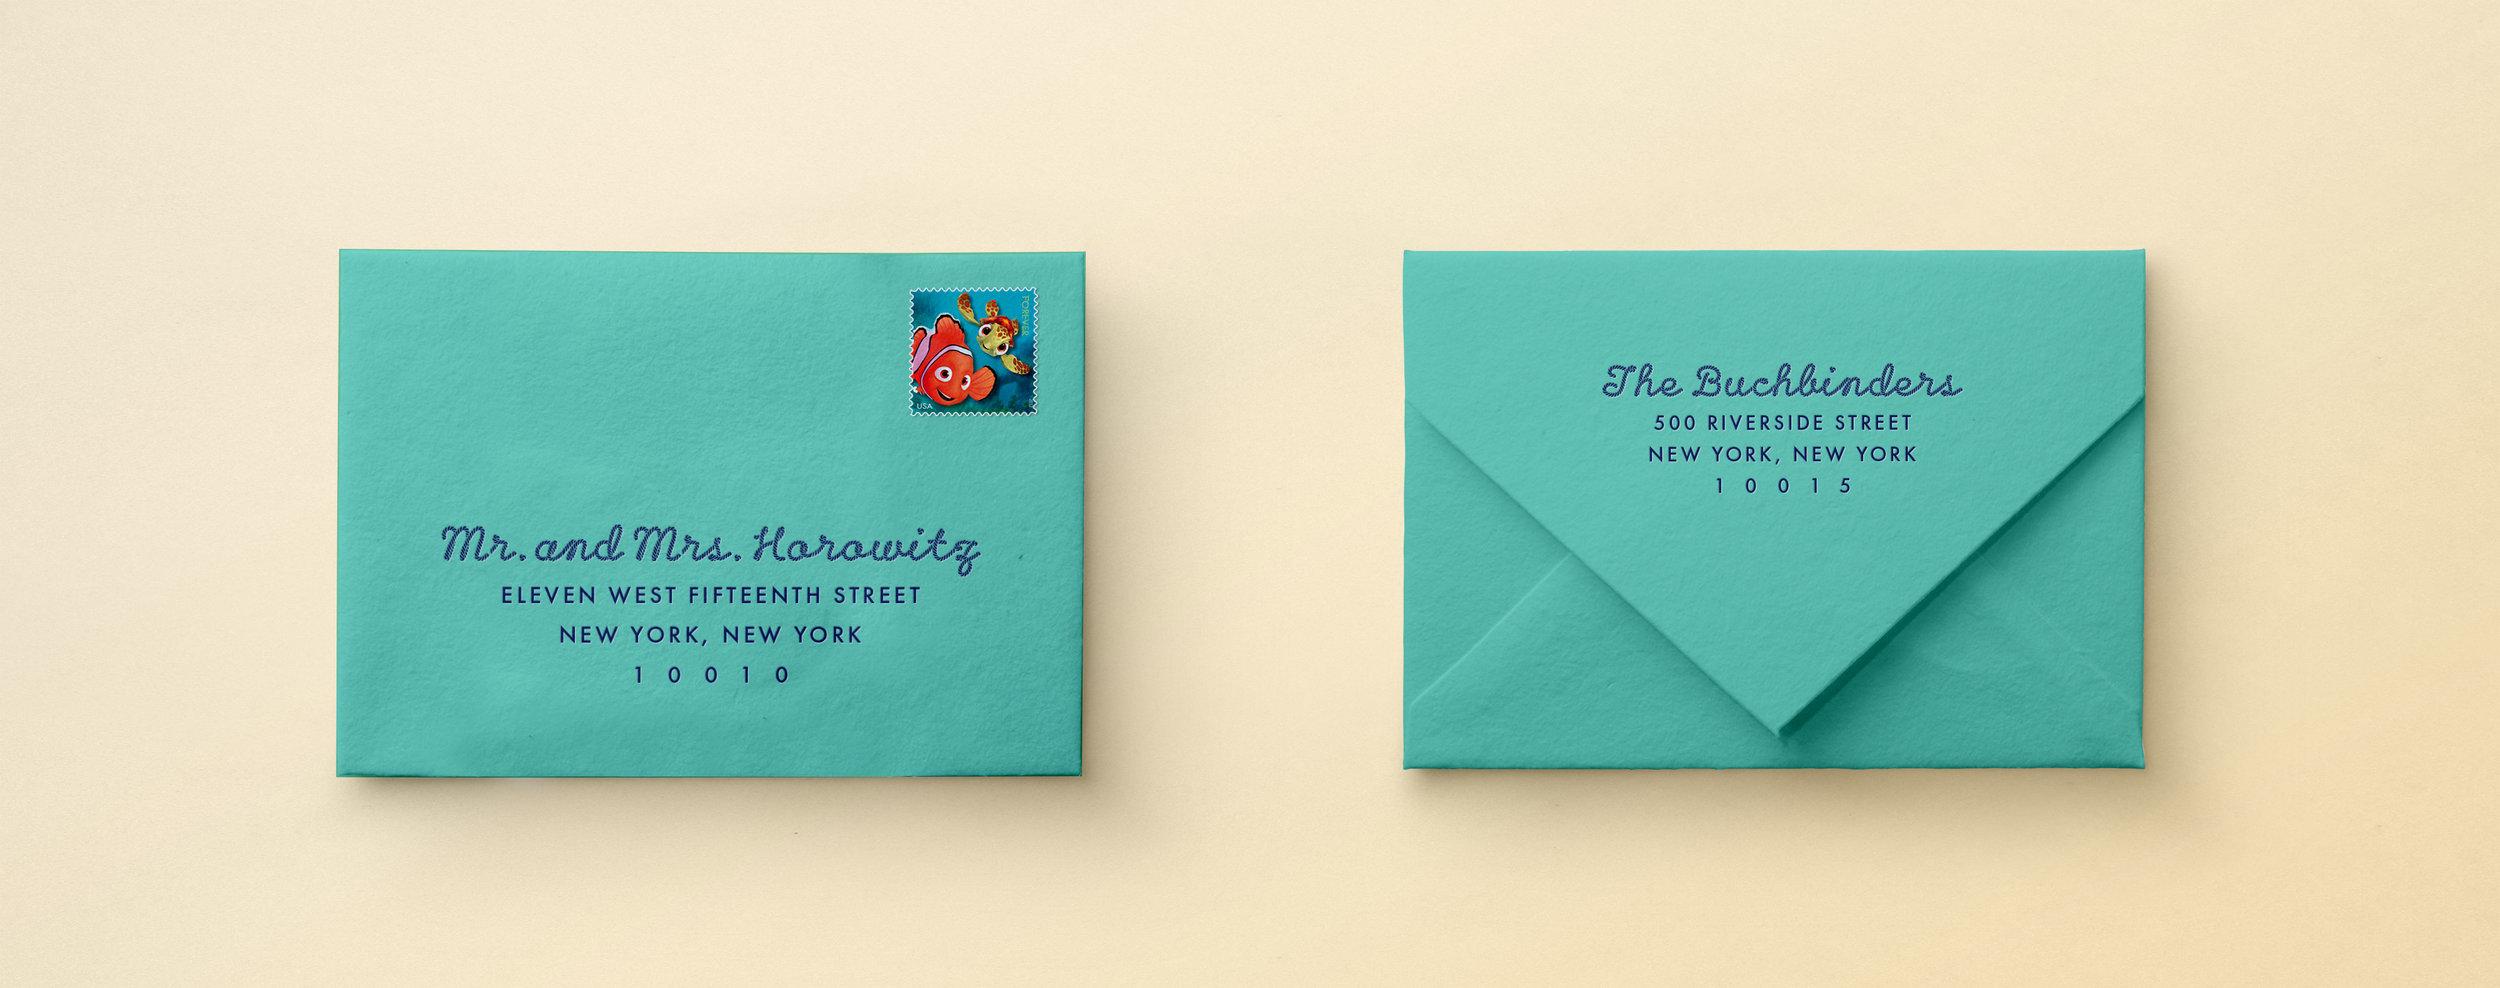 Vidhi-Dattani-teal-letterpress-envelopes.jpg